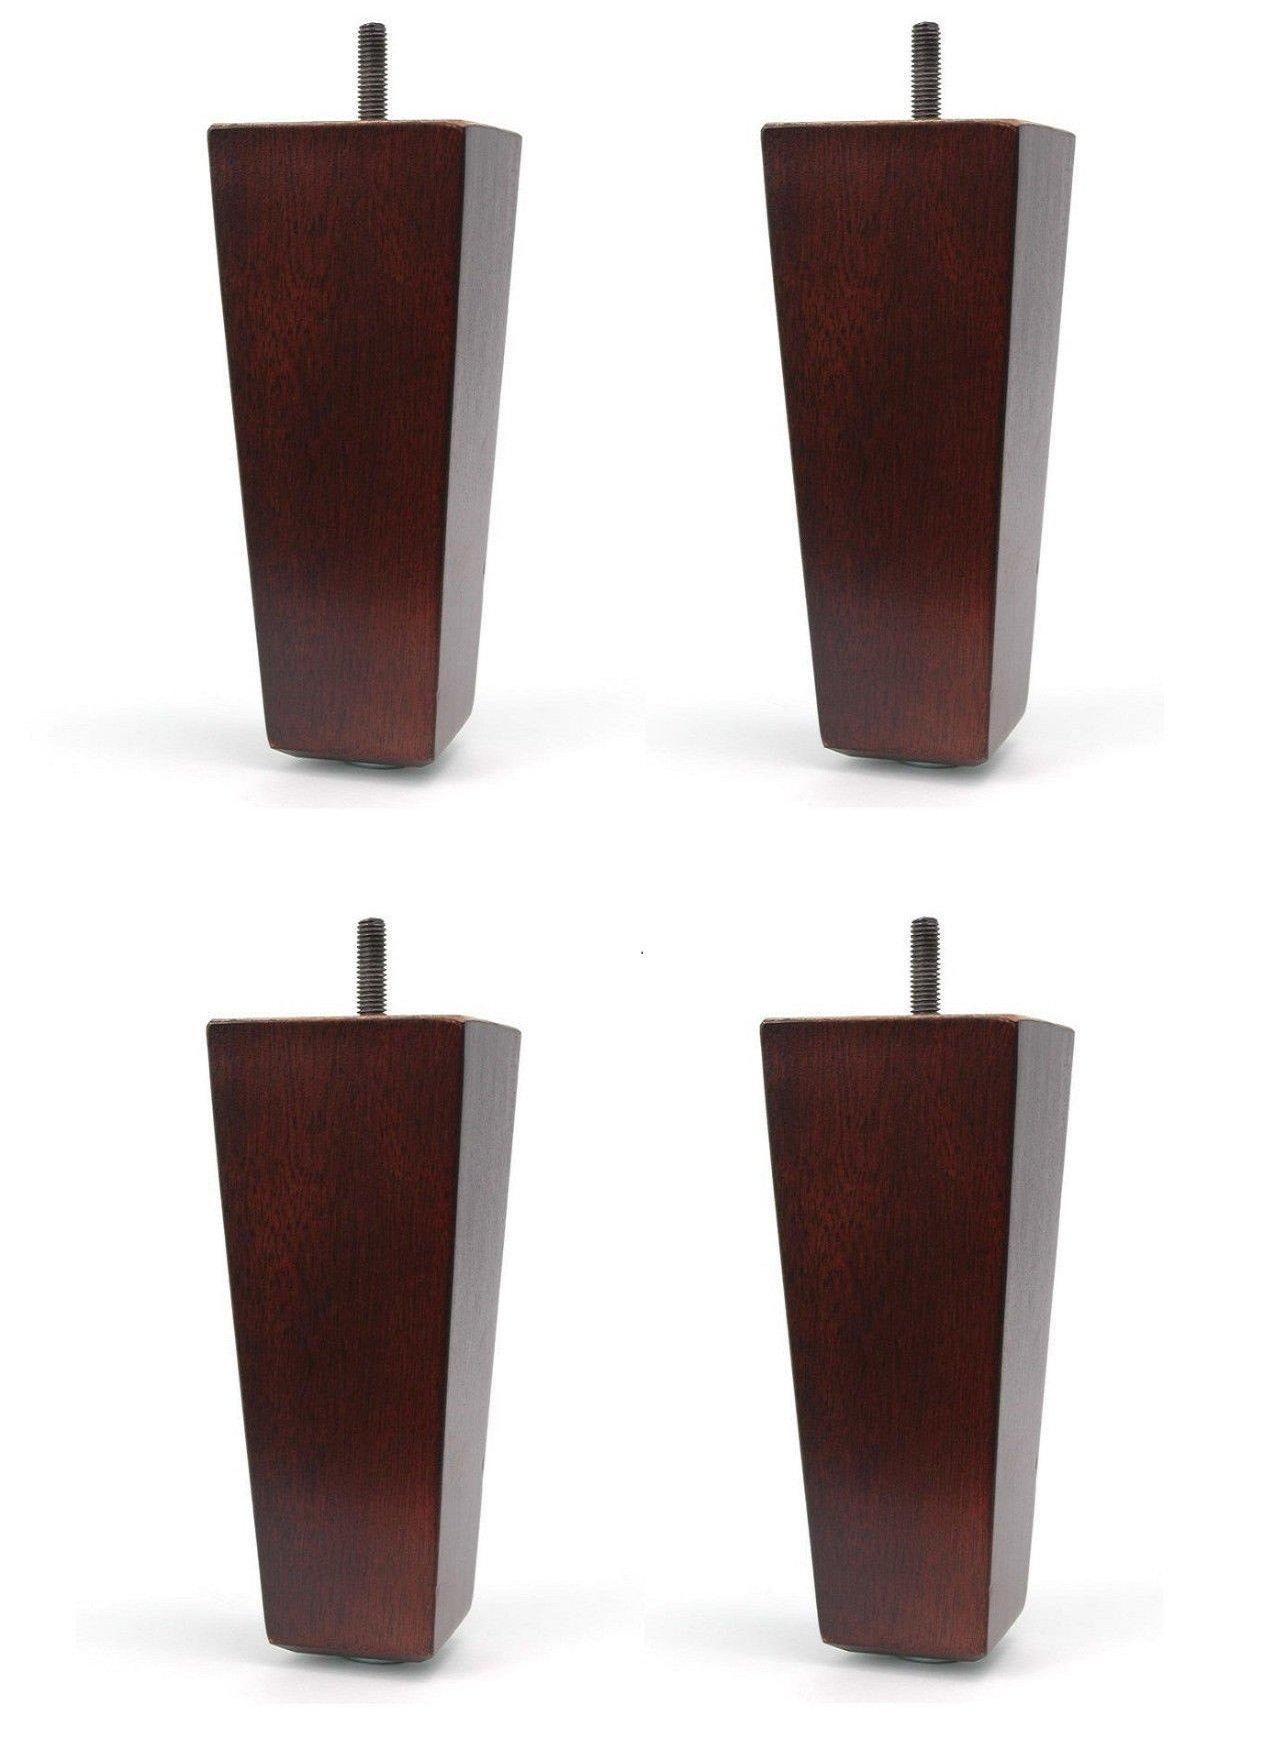 7'' Wood Tapered Pyramid Dark Walnut Sofa / Chair / Ottoman [5/16'' Bolt] Replacement Legs - Set of 4